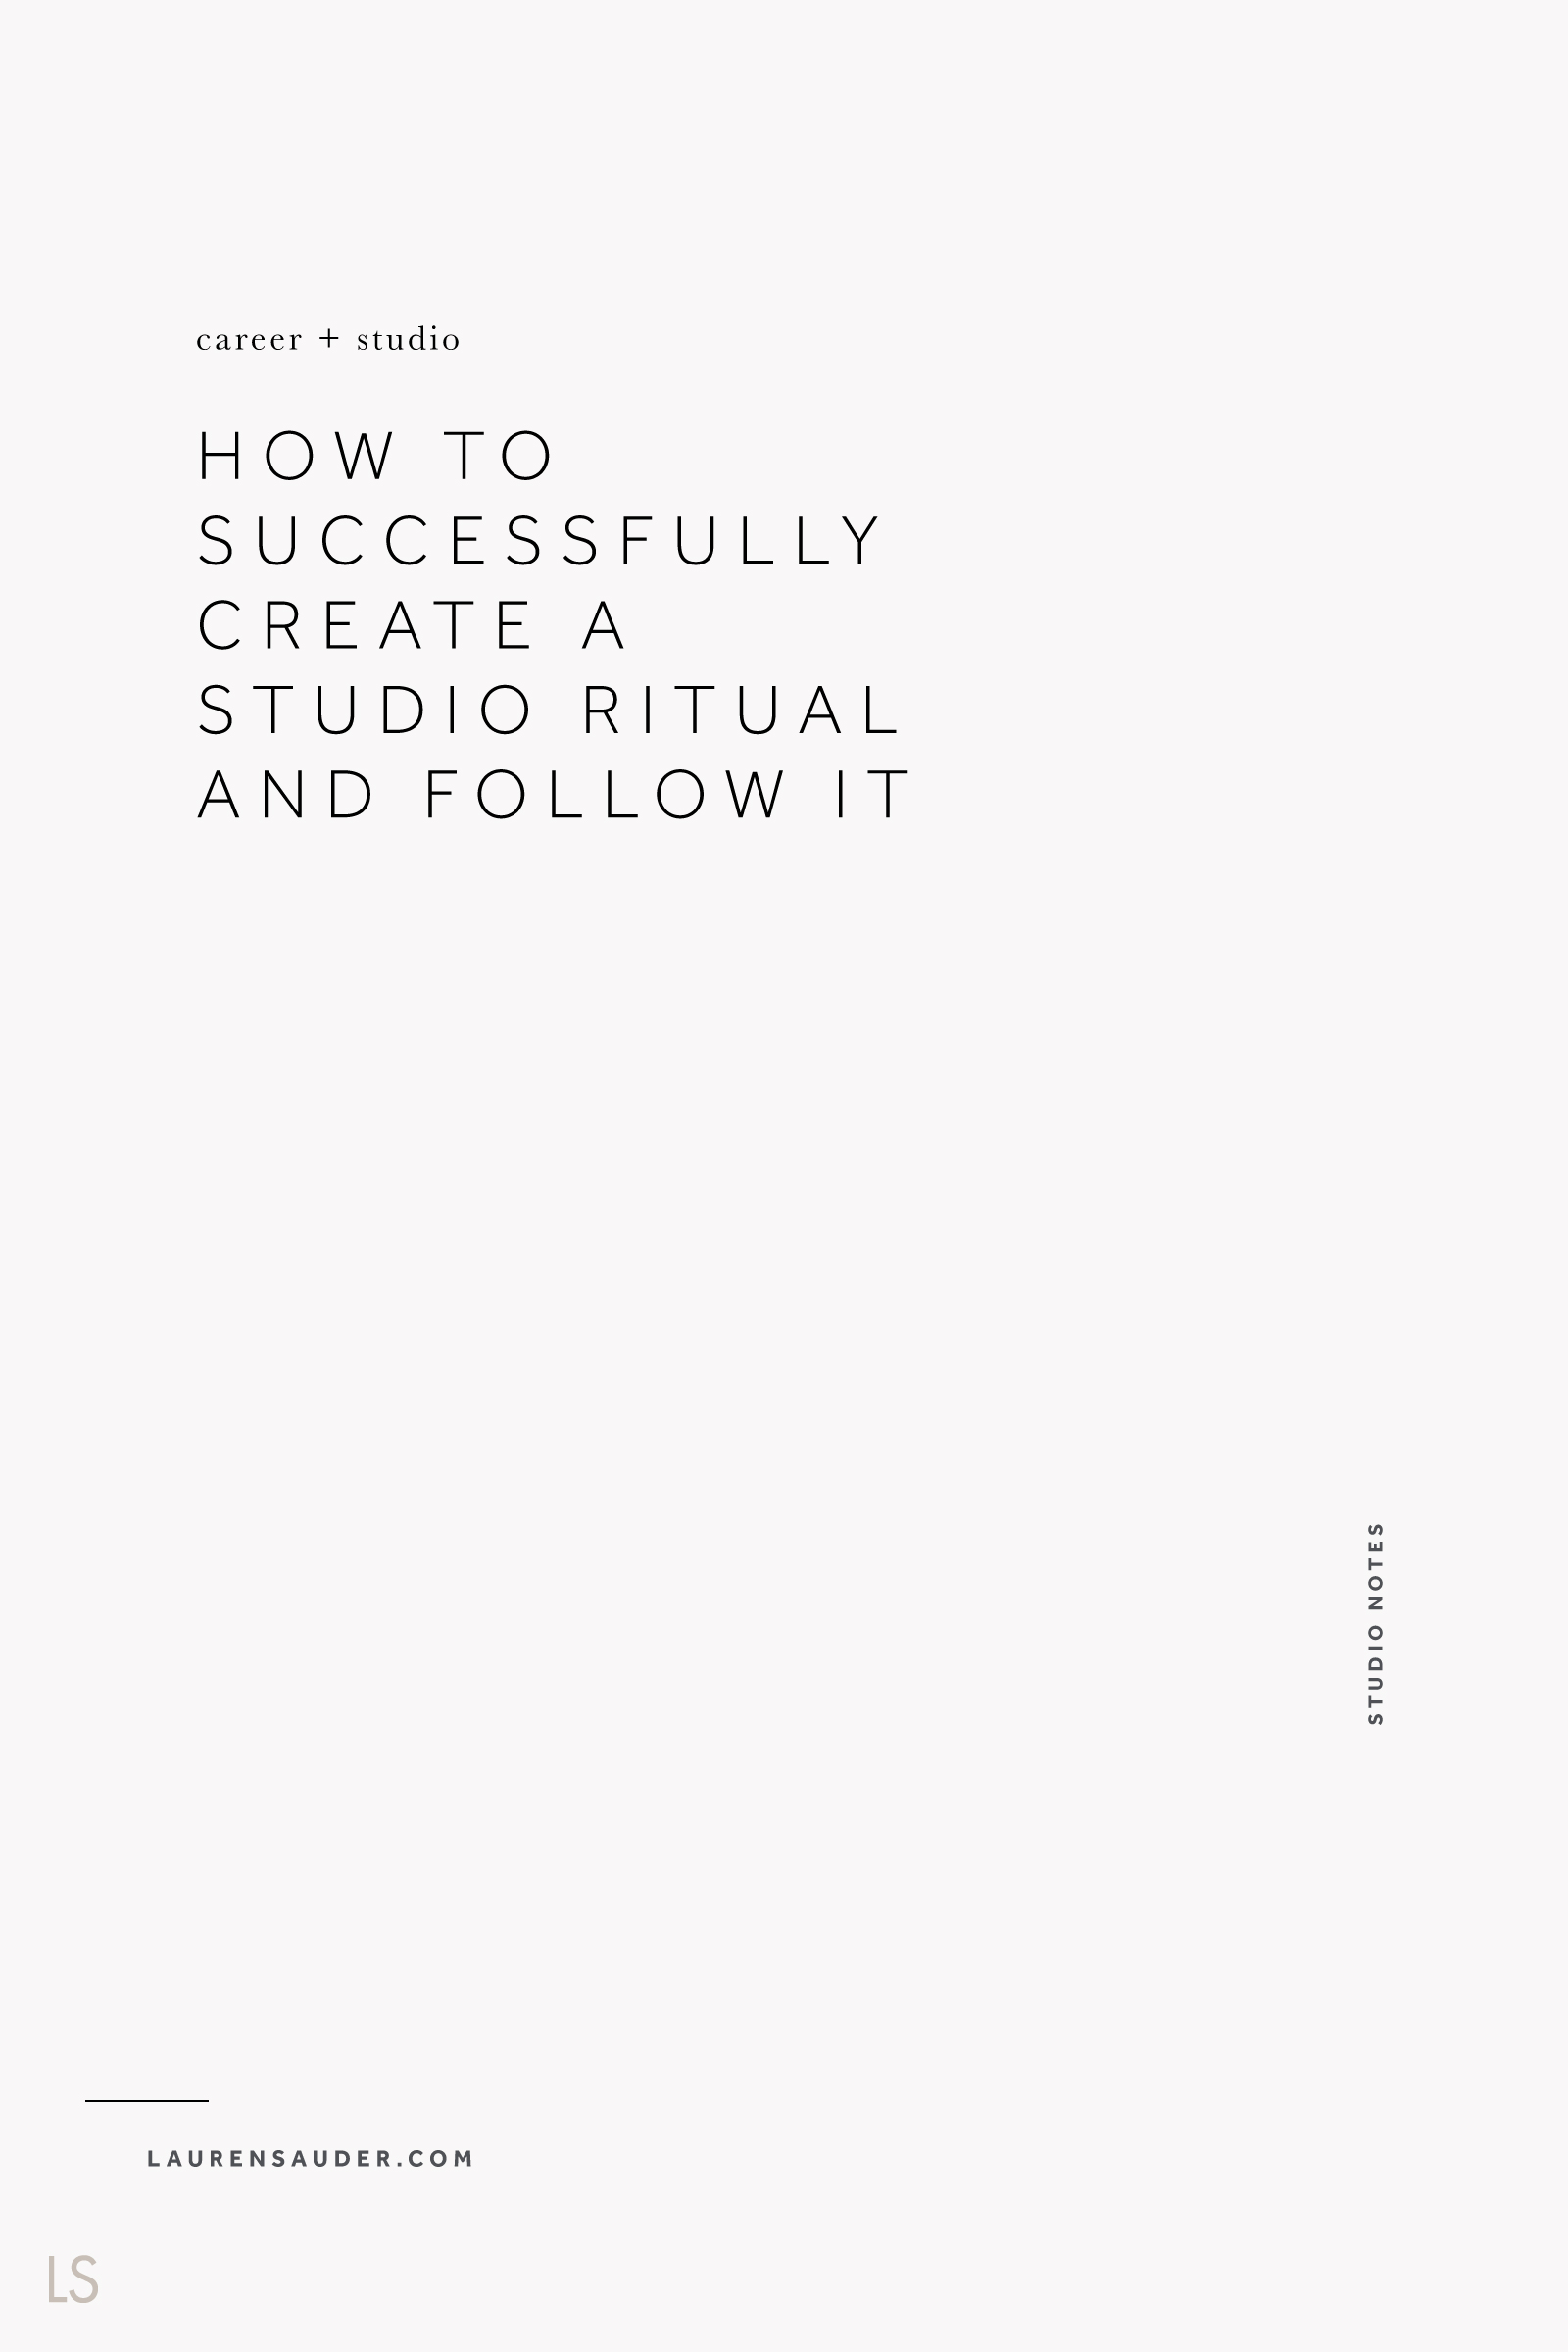 How to Successfully Create a Studio Ritual and Follow It by Lauren Sauder studio ritual, studio practice, creative habit, artist studio help, artist studio advice